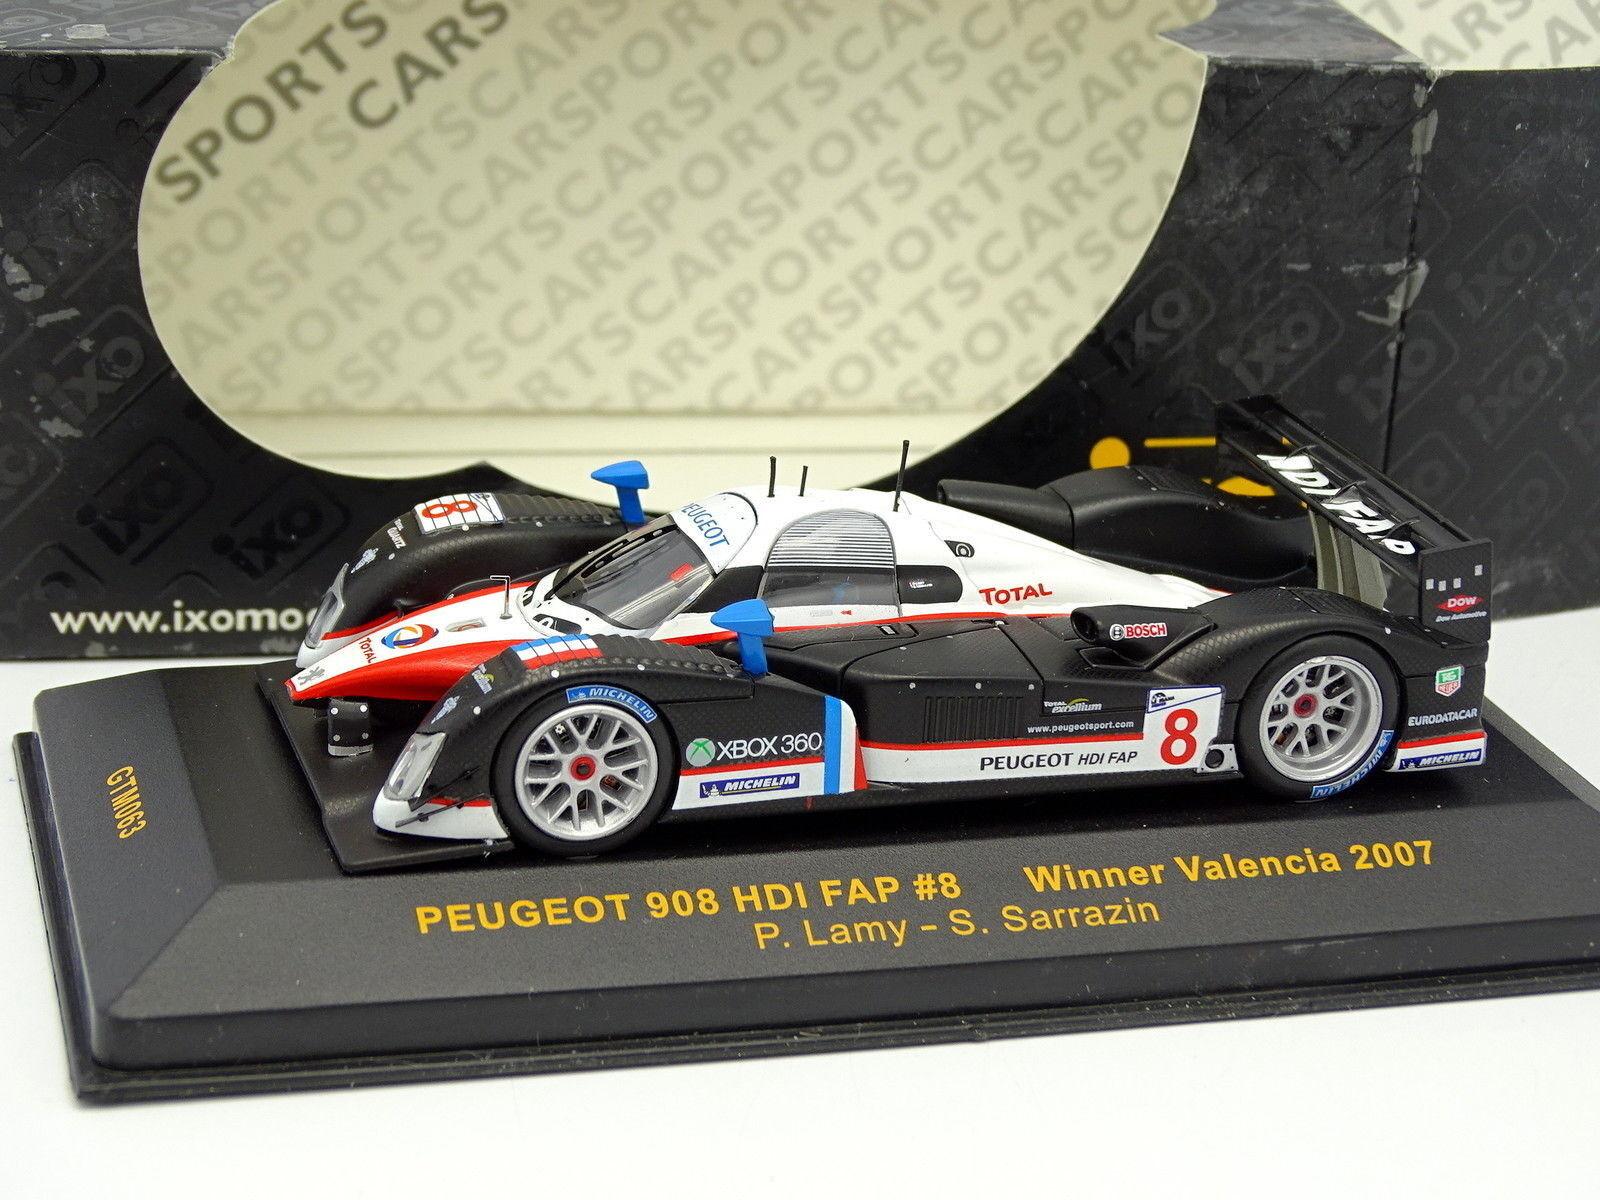 Ixo 1 43 - Peugeot 908 908 908 HDI FAP N°8 Winner Valencia 2007 7fb7e8